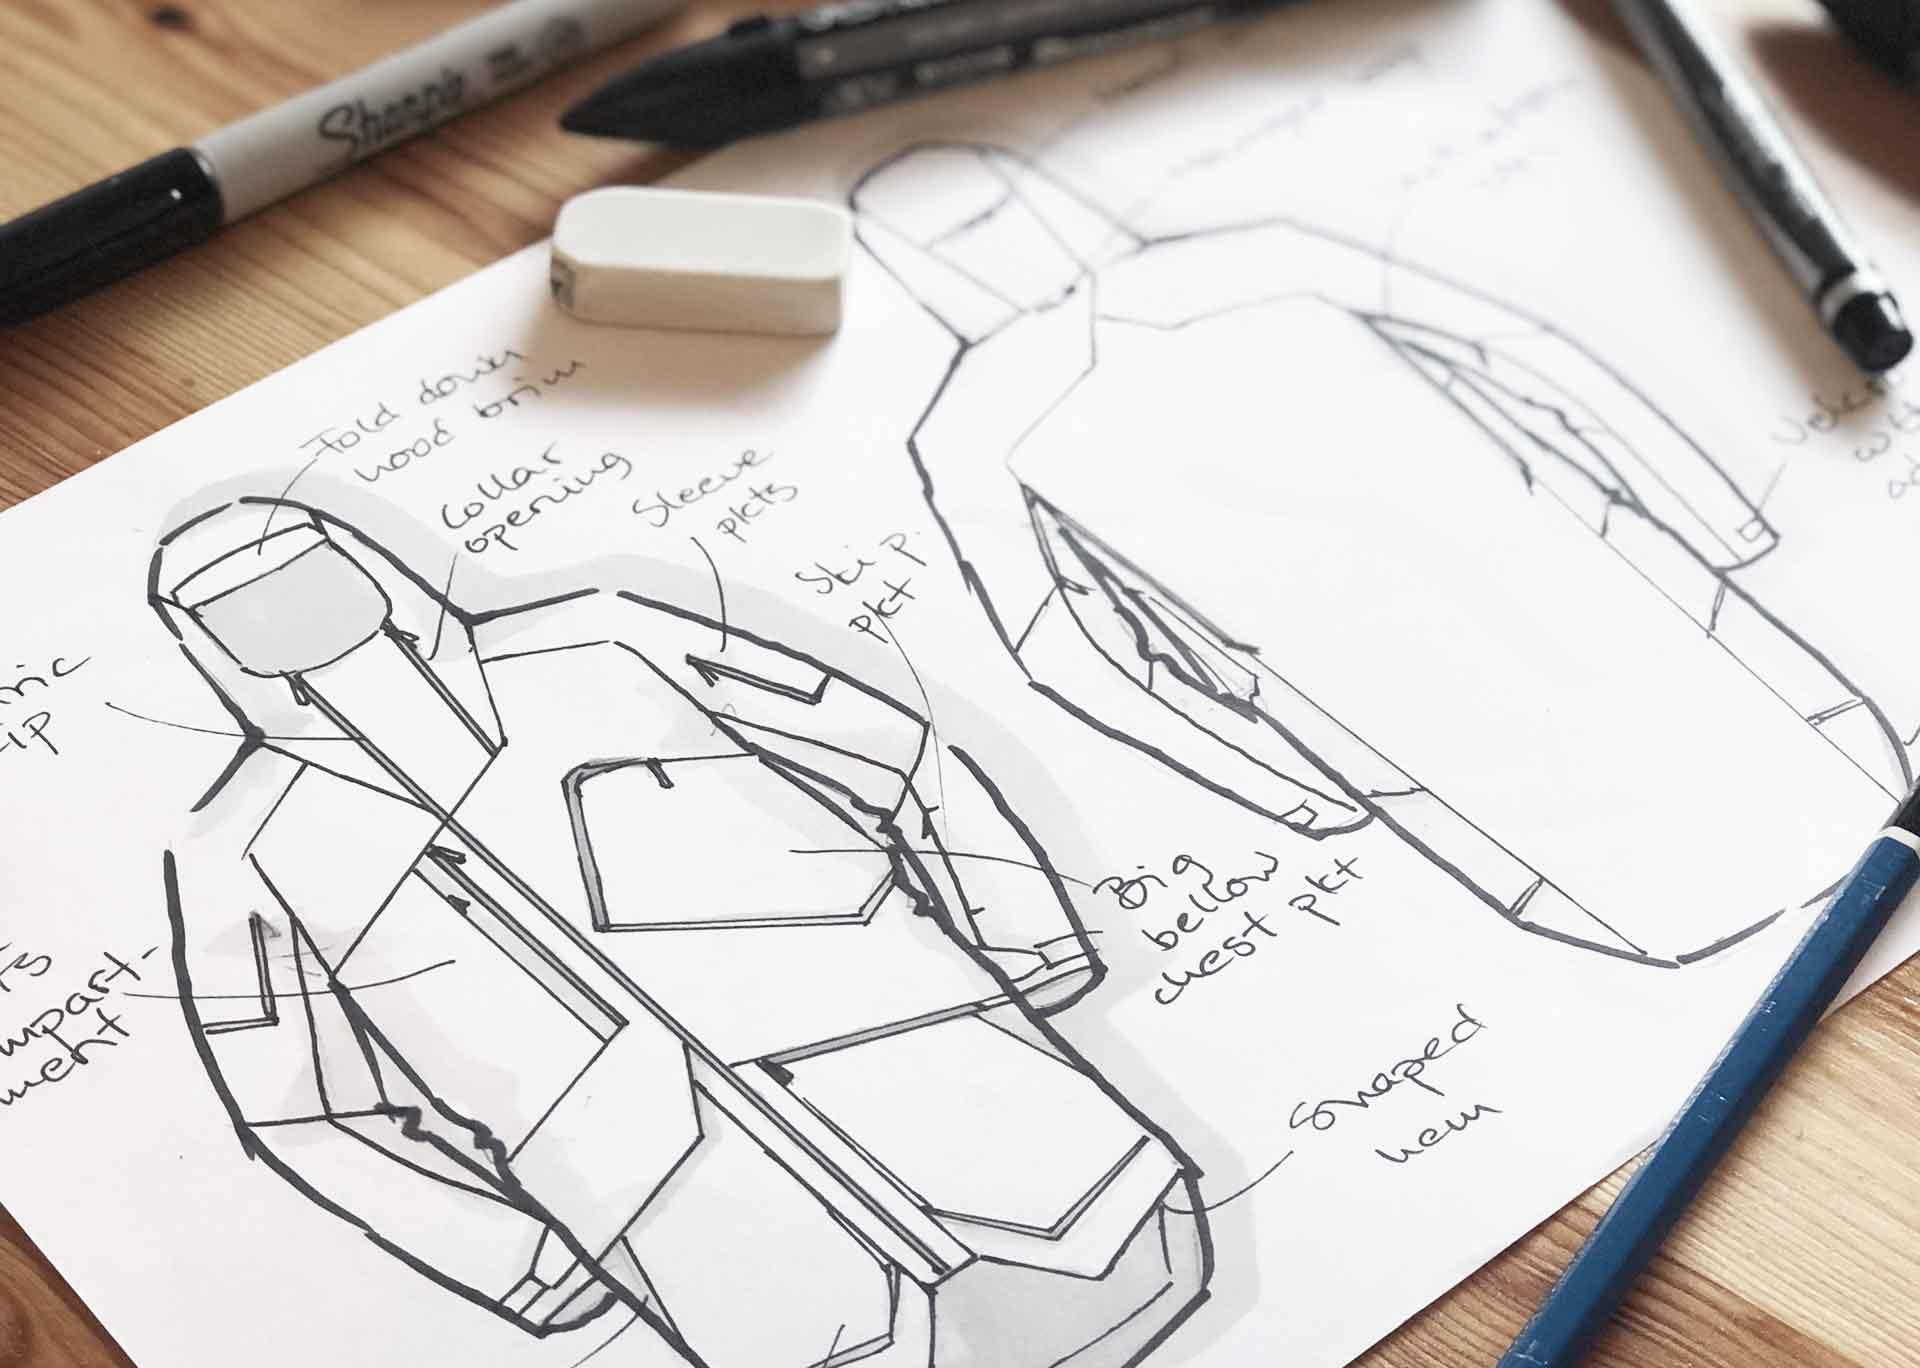 Apparel Entrepreneurship How to Design Your Clothing Line